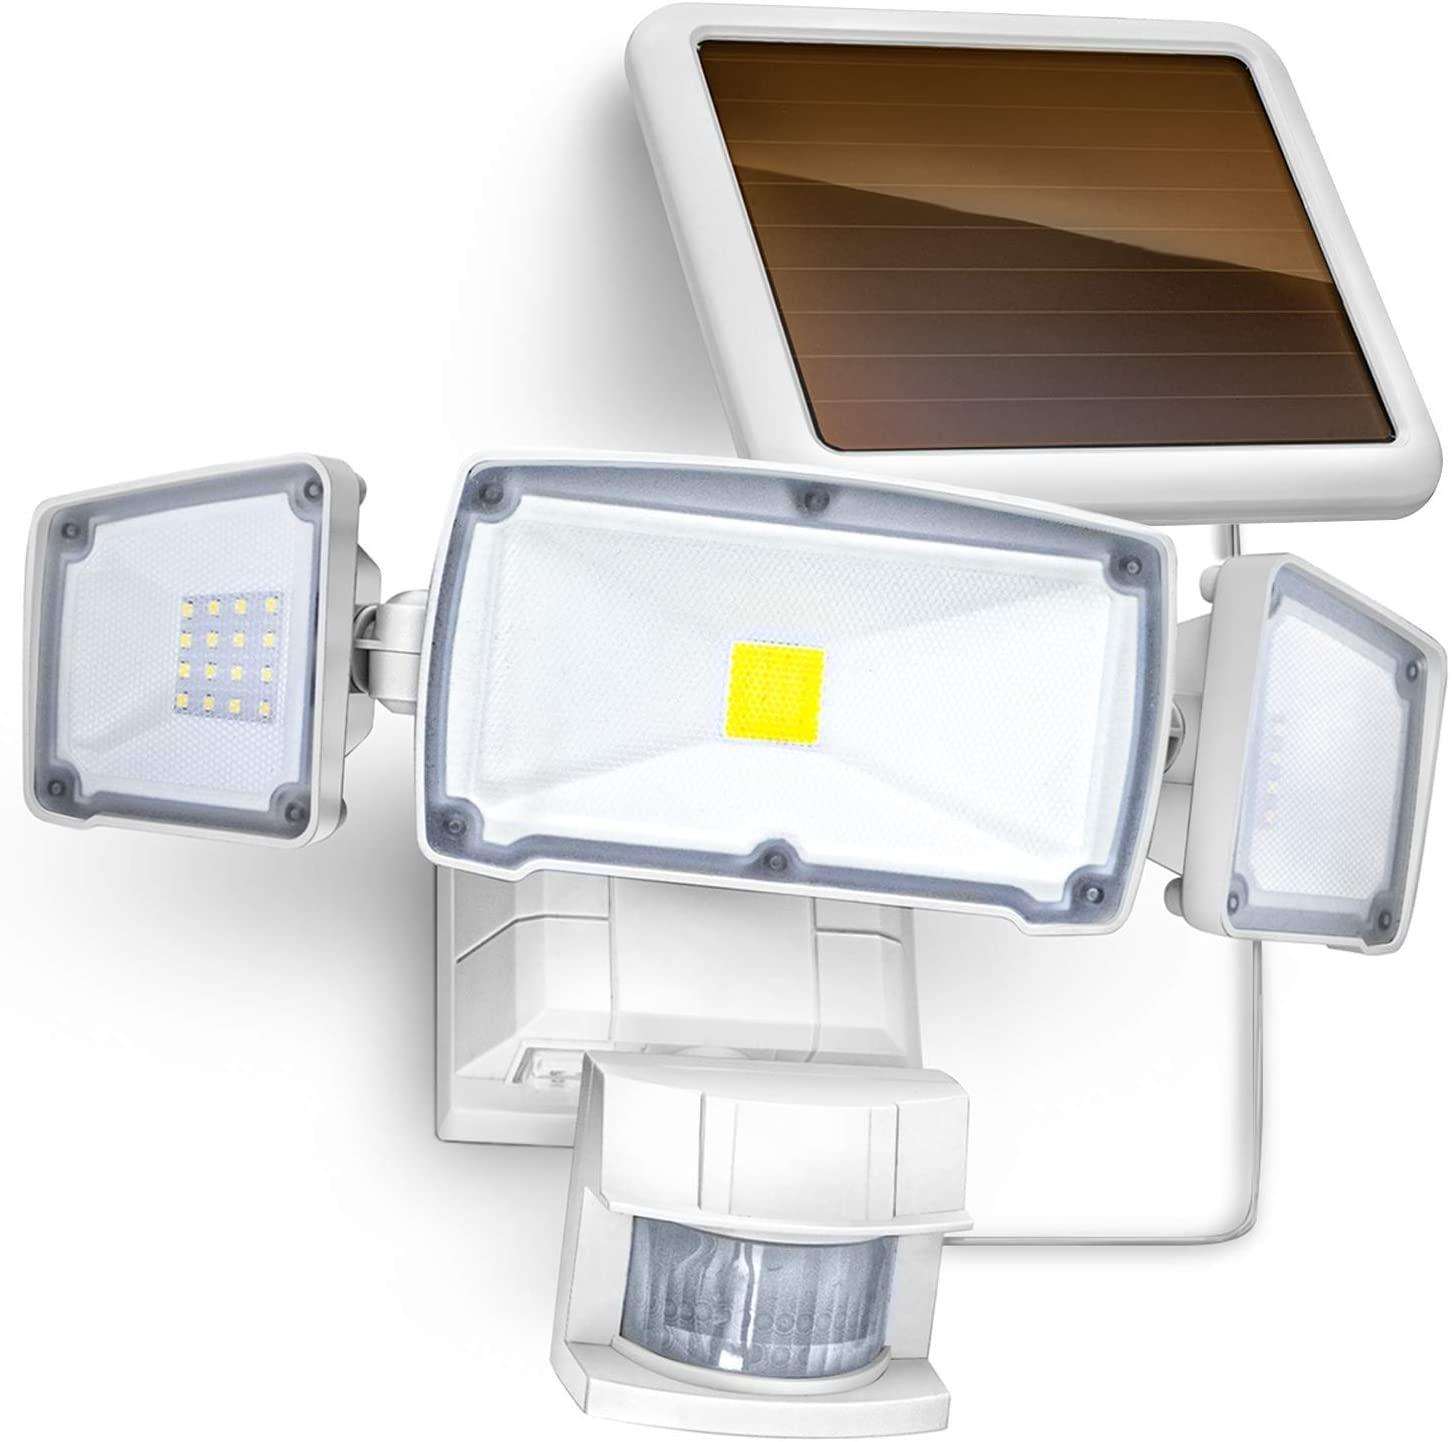 Solar Motion Sensor Security Light with 1500 Lumen Triple Head LED $19.79 + Free Shipping w/ Prime